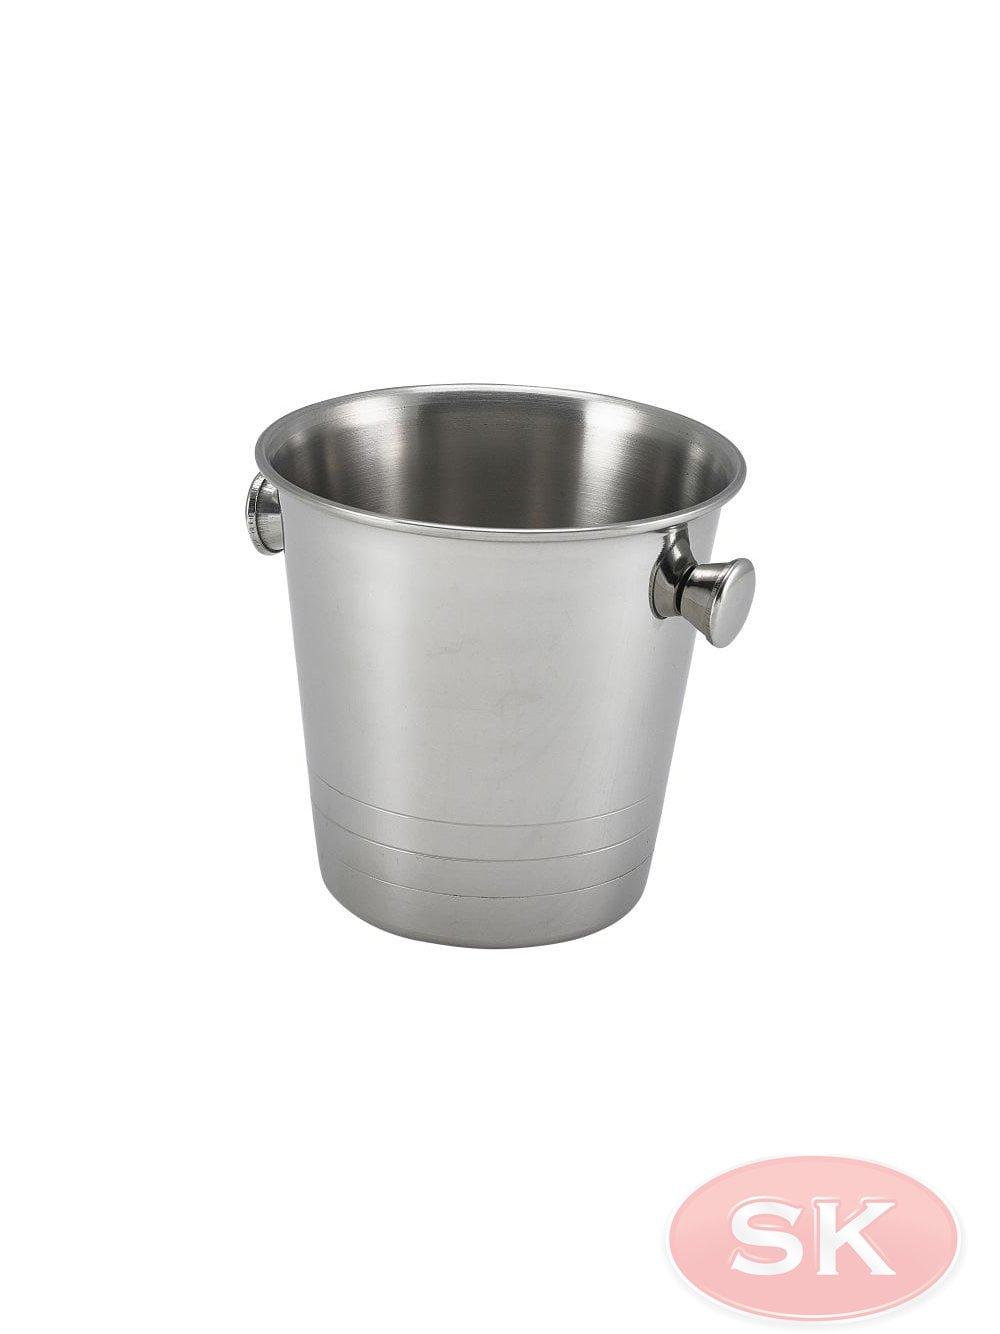 Genware Mini Stainless Steel Ice Bucket 10cm Barware From Sylvester Keal Uk